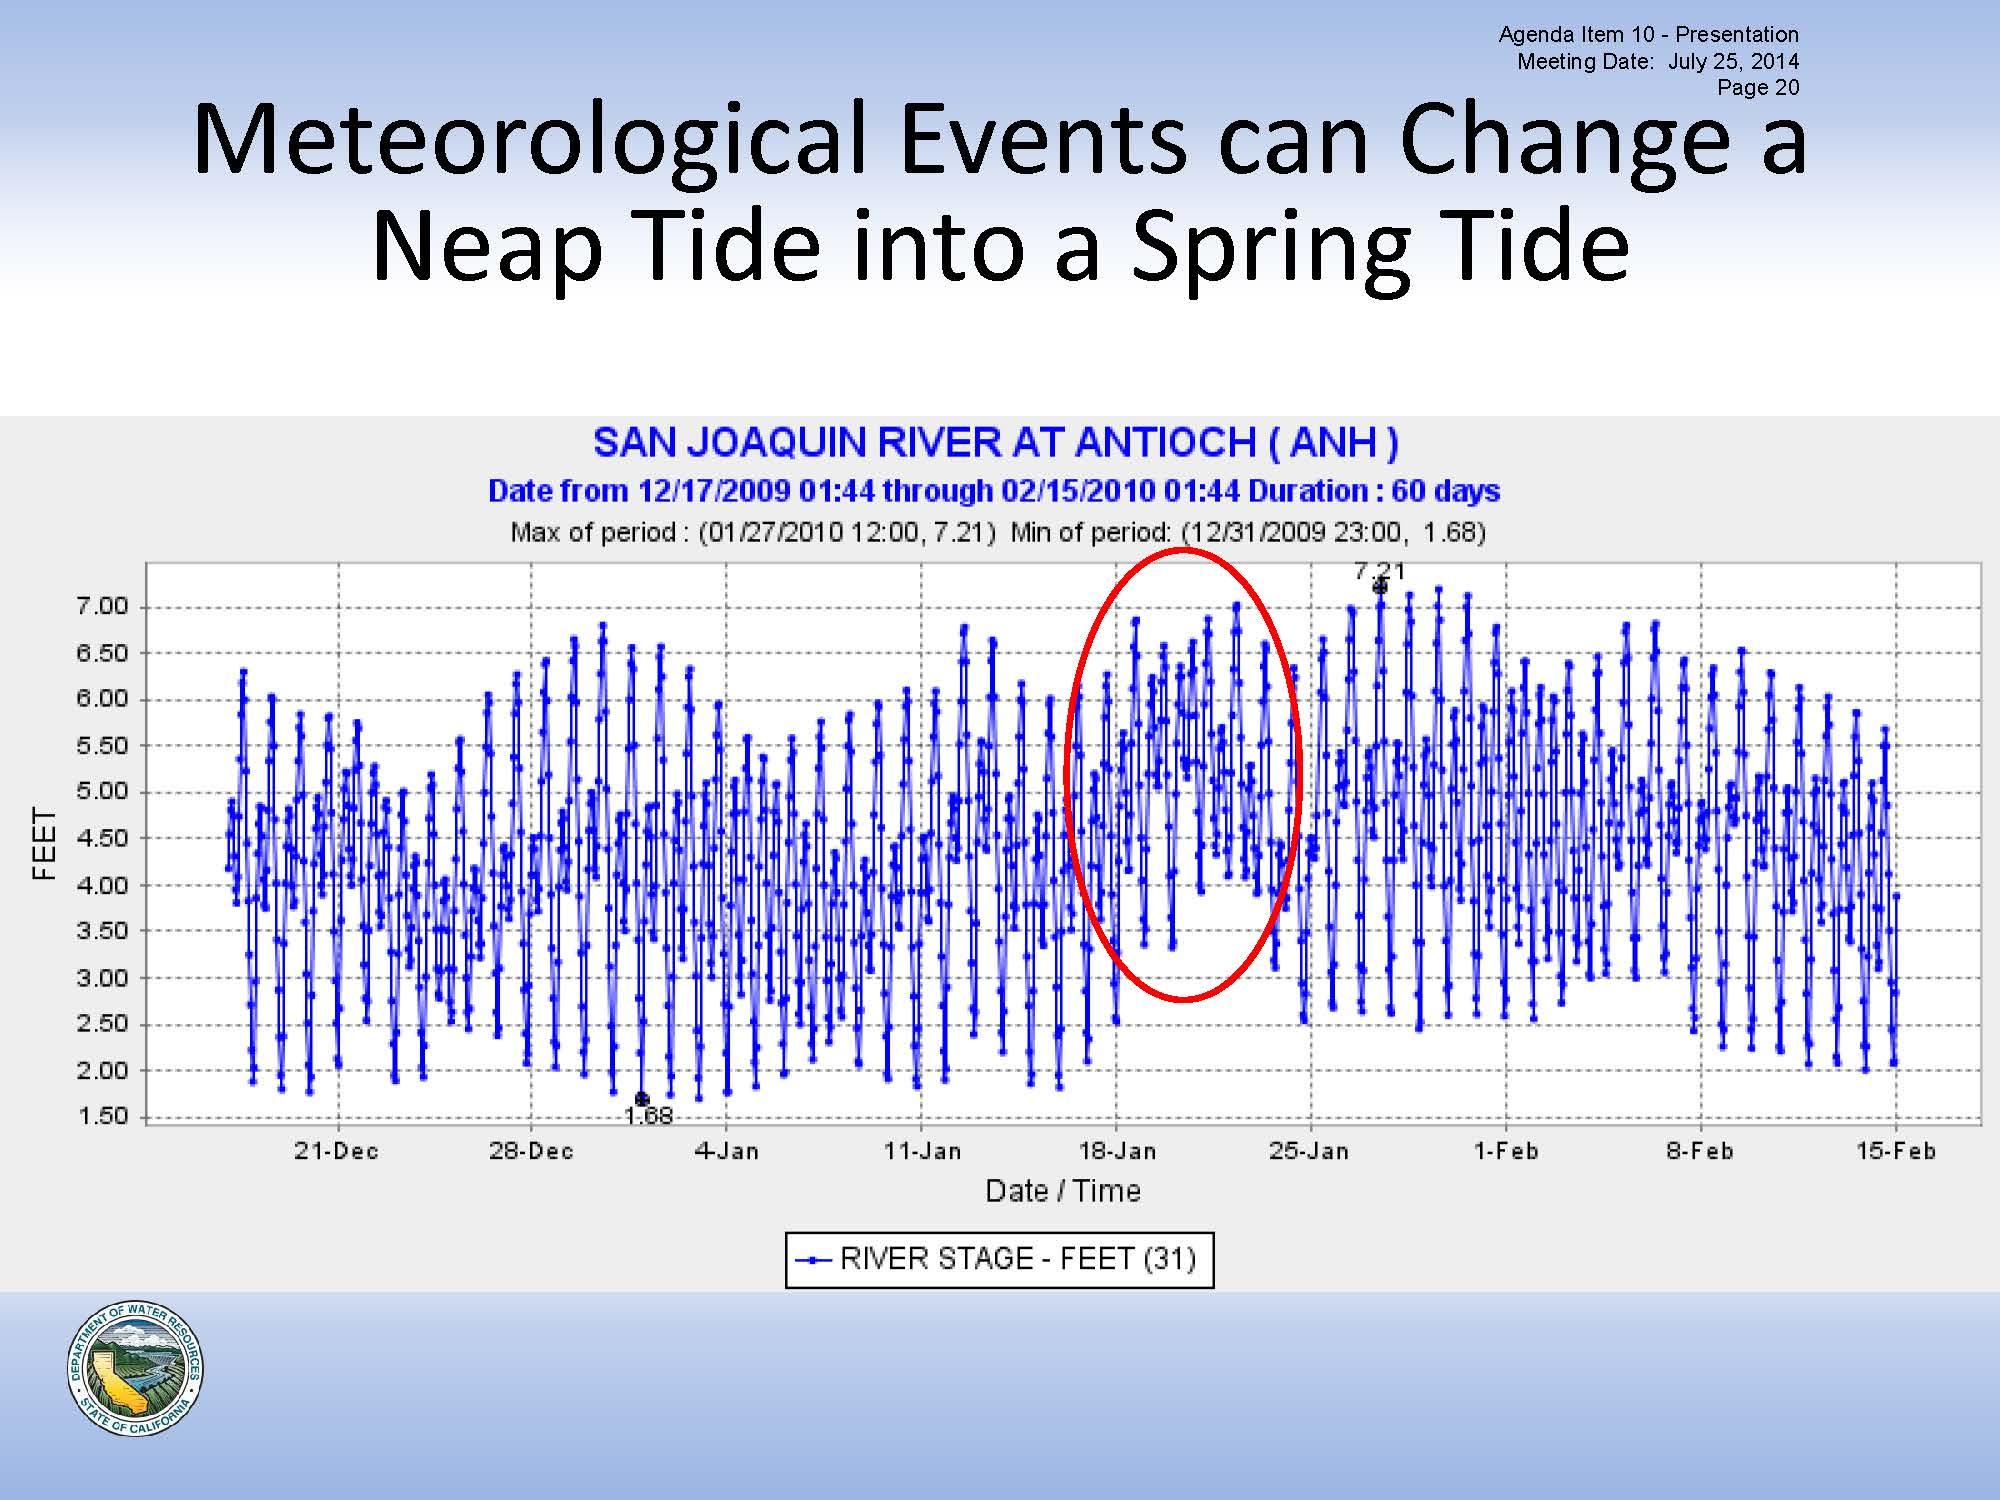 Cape may nj tide chart images free any chart examples hampton beach tide chart choice image free any chart examples tide height chart choice image free nvjuhfo Images